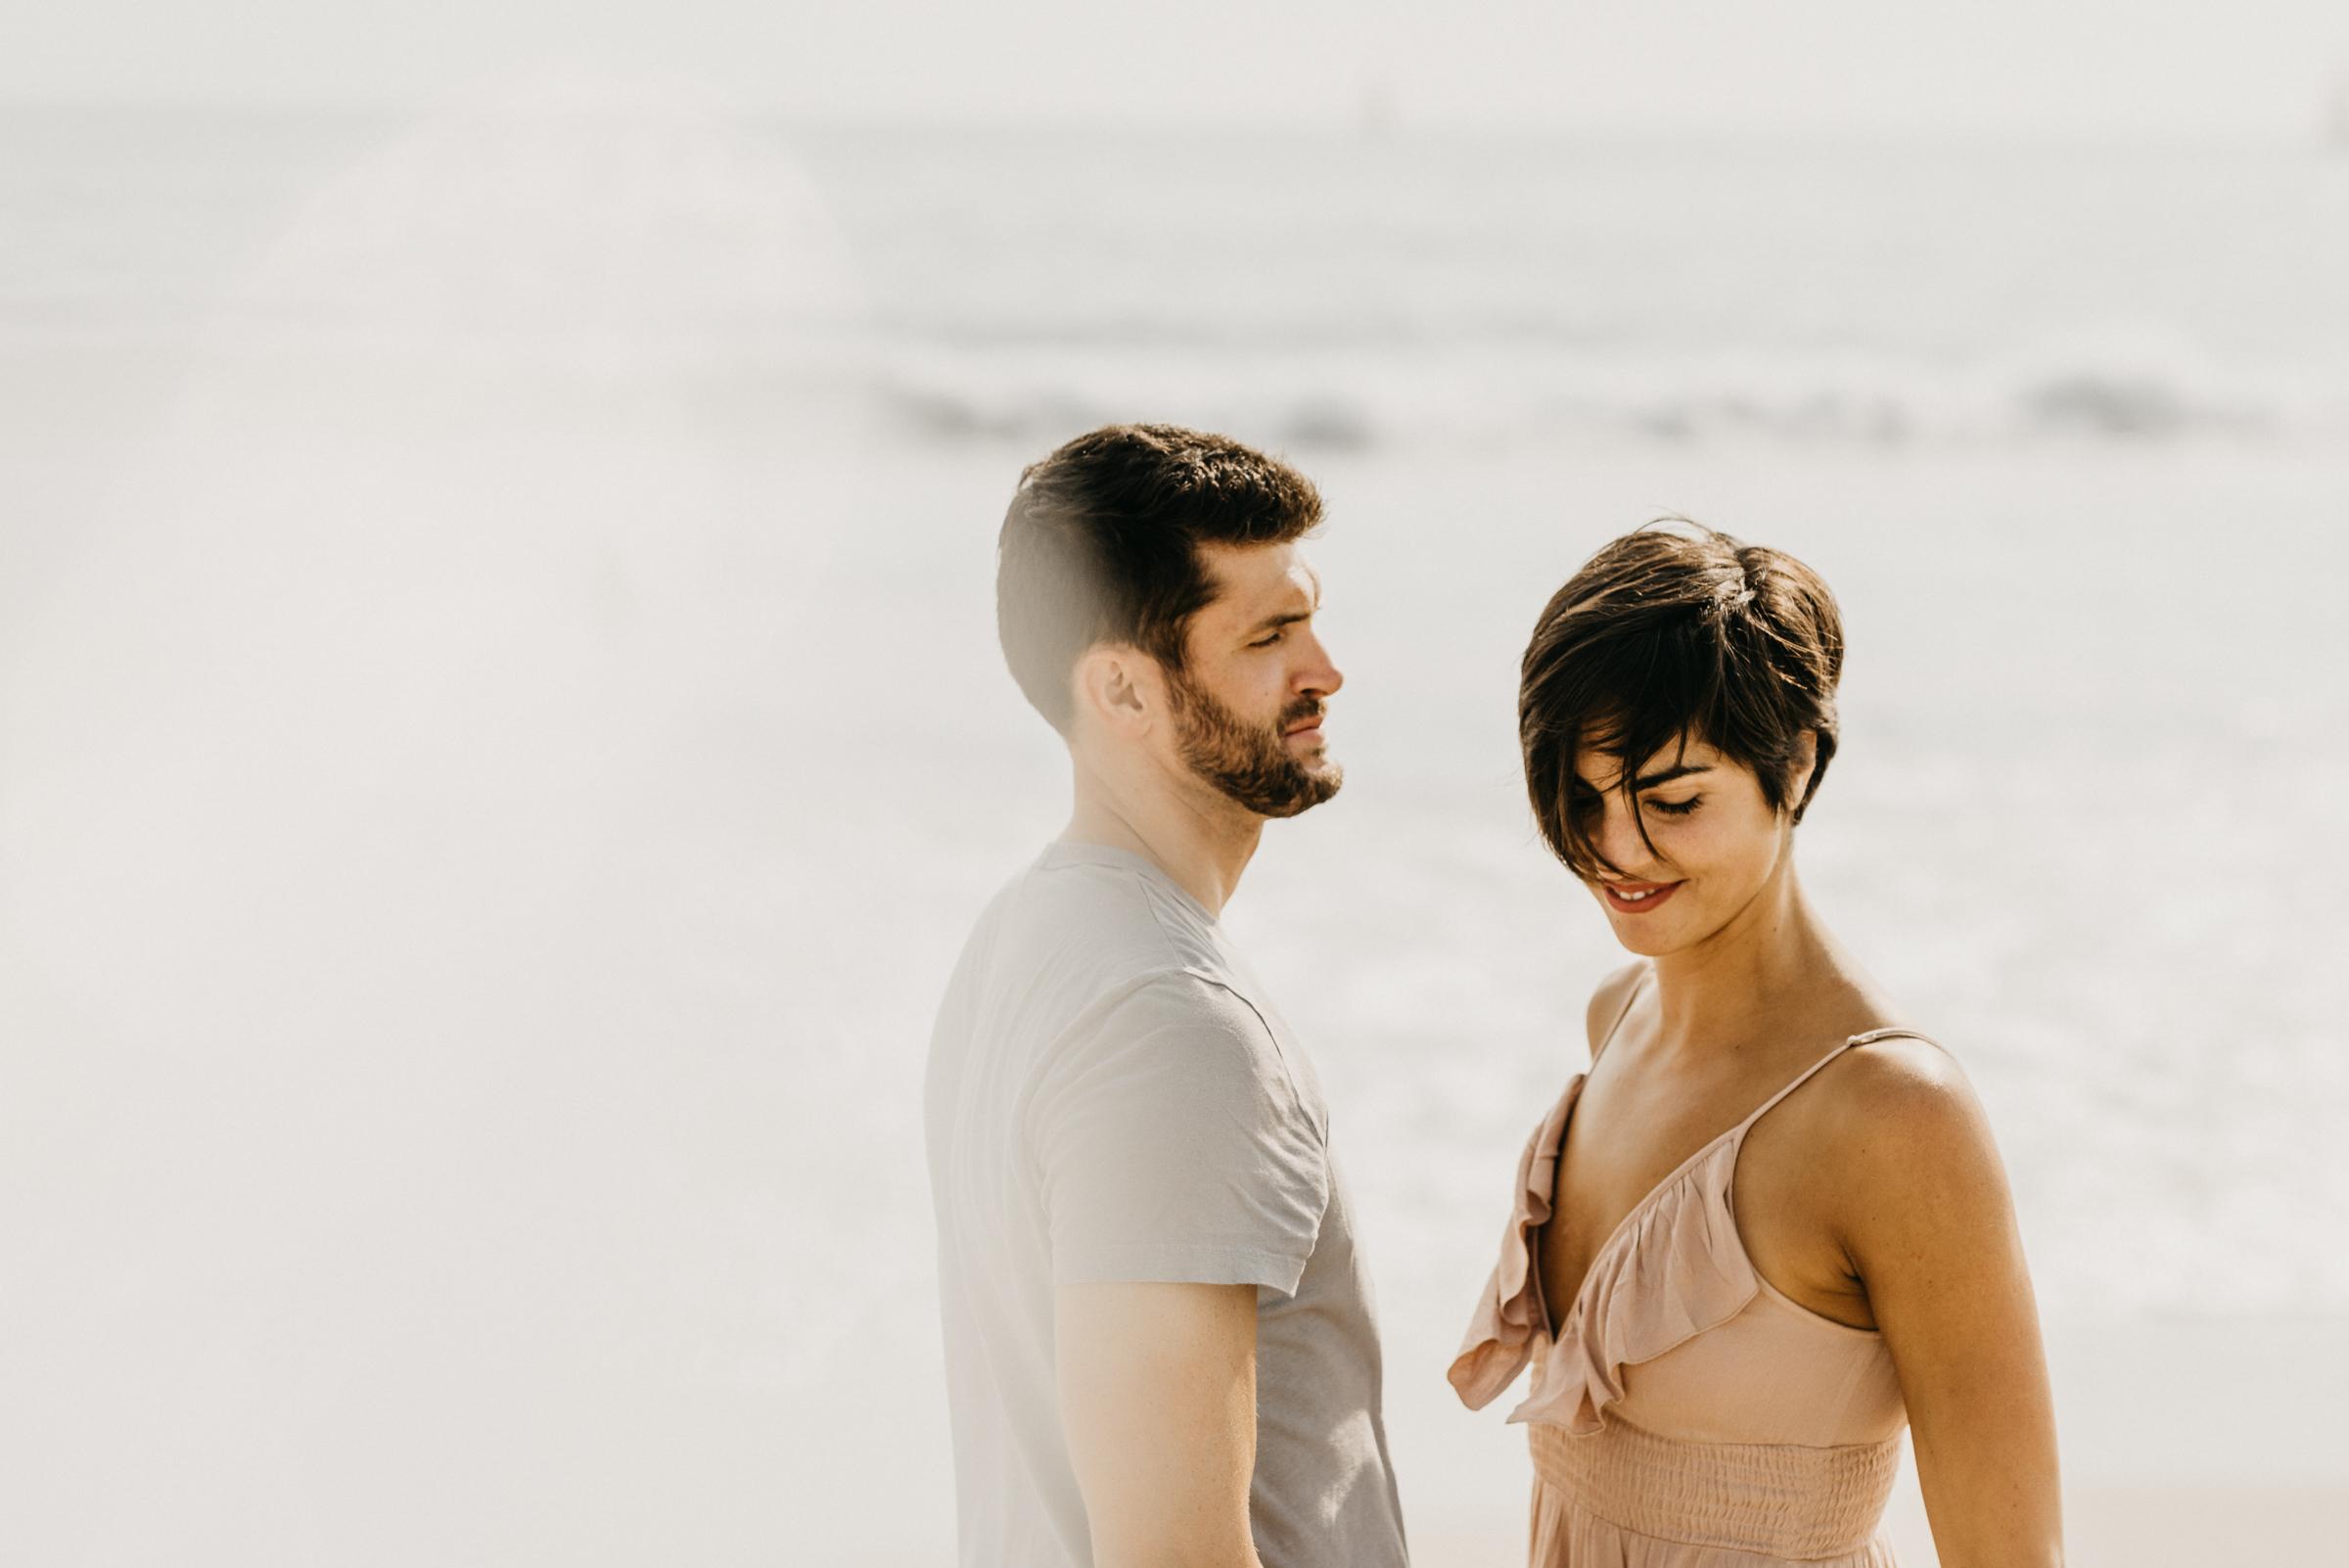 Isaiah + Taylor Photography - Venice Beach & Santa Monica Engagement Session, Los Angeles Wedding Photographer-059.jpg